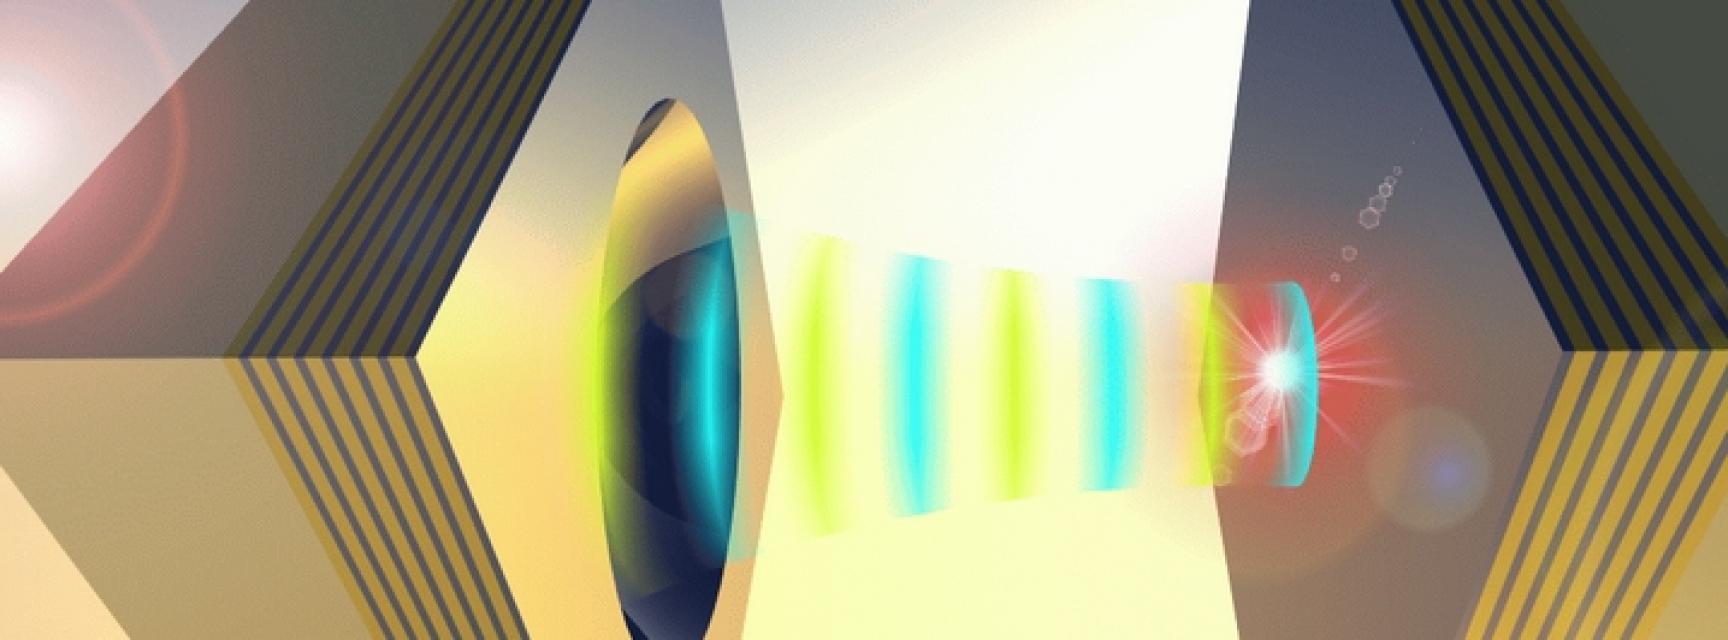 Photonic Nanomaterials